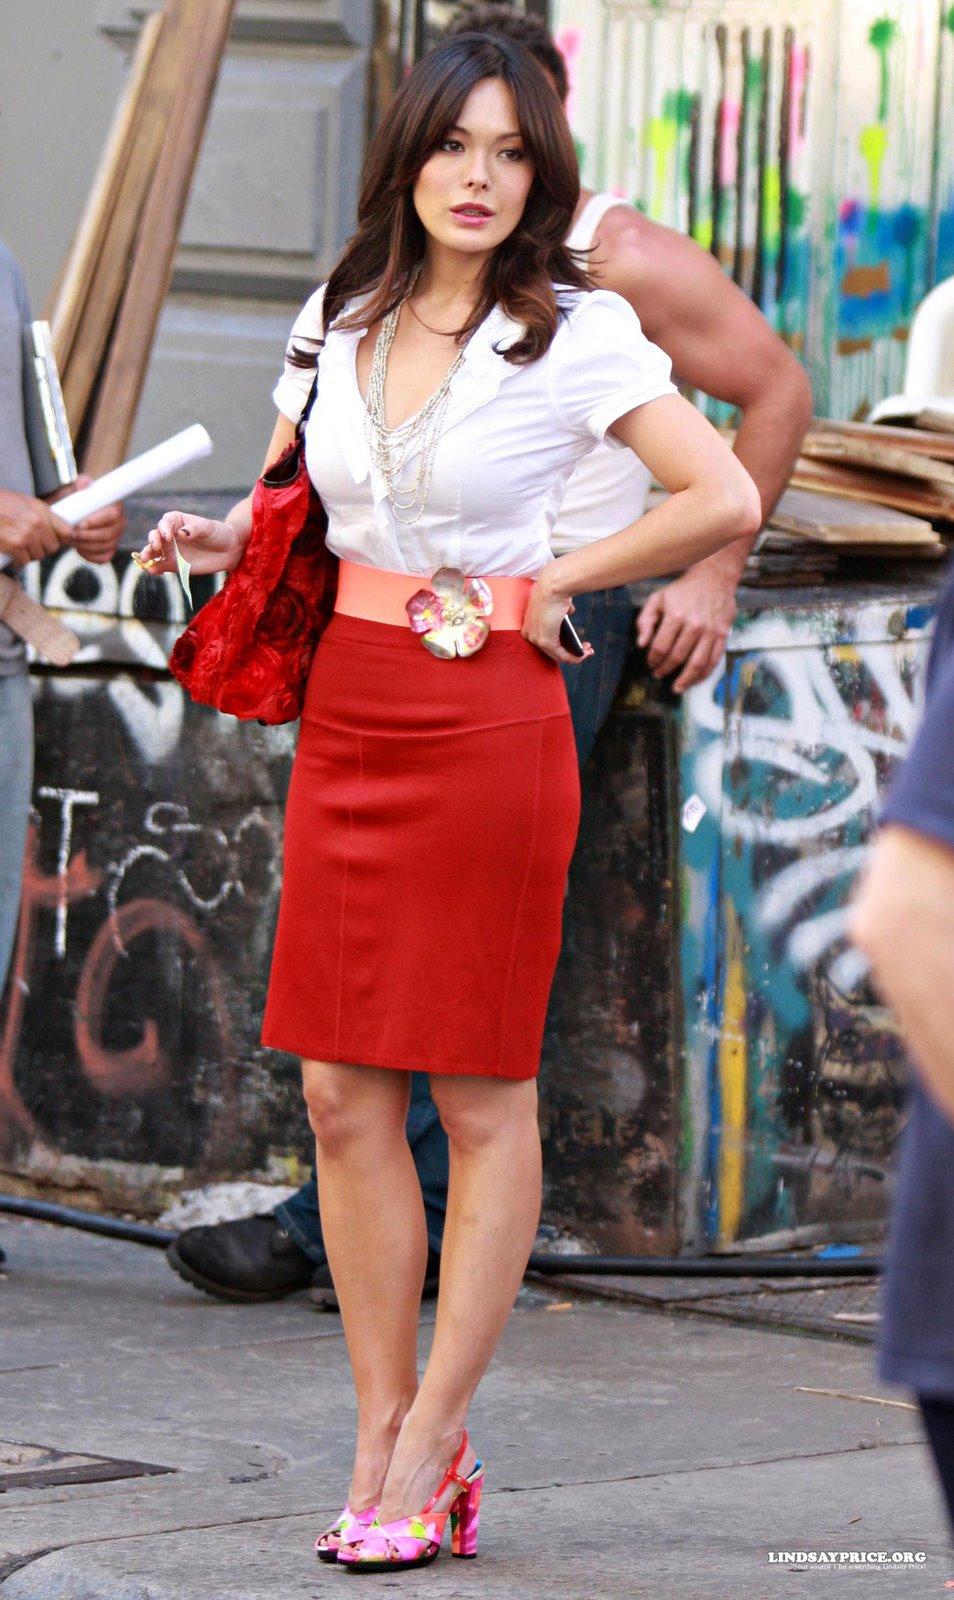 Lindsay price hot nudes (56 photo)